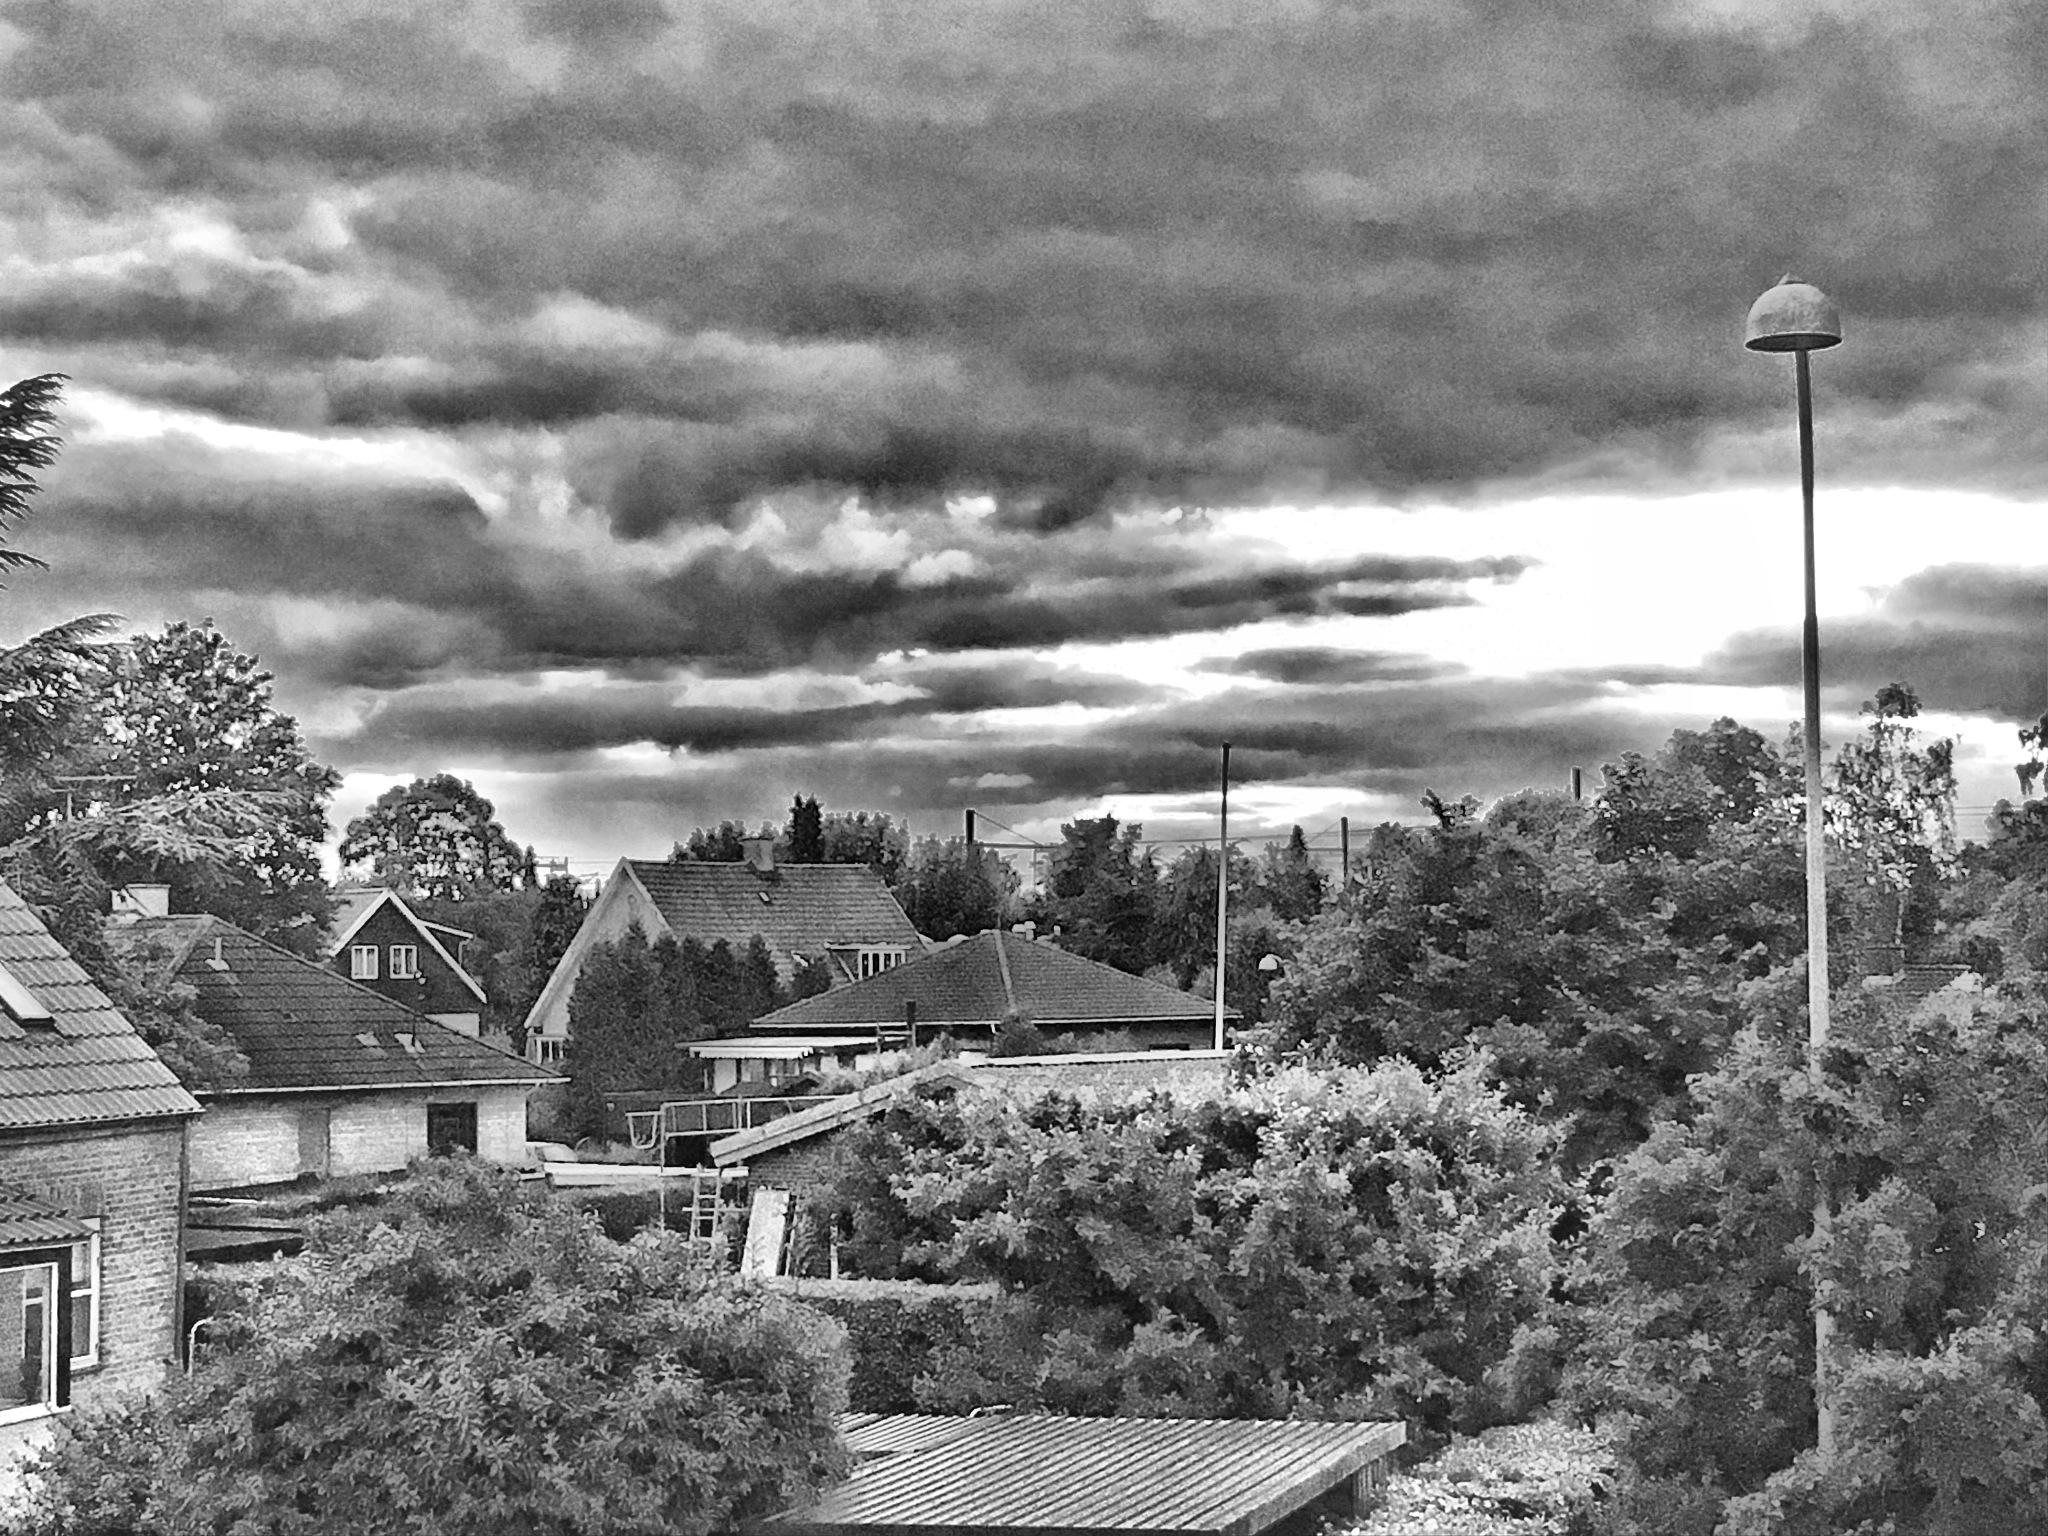 View by kulefe31